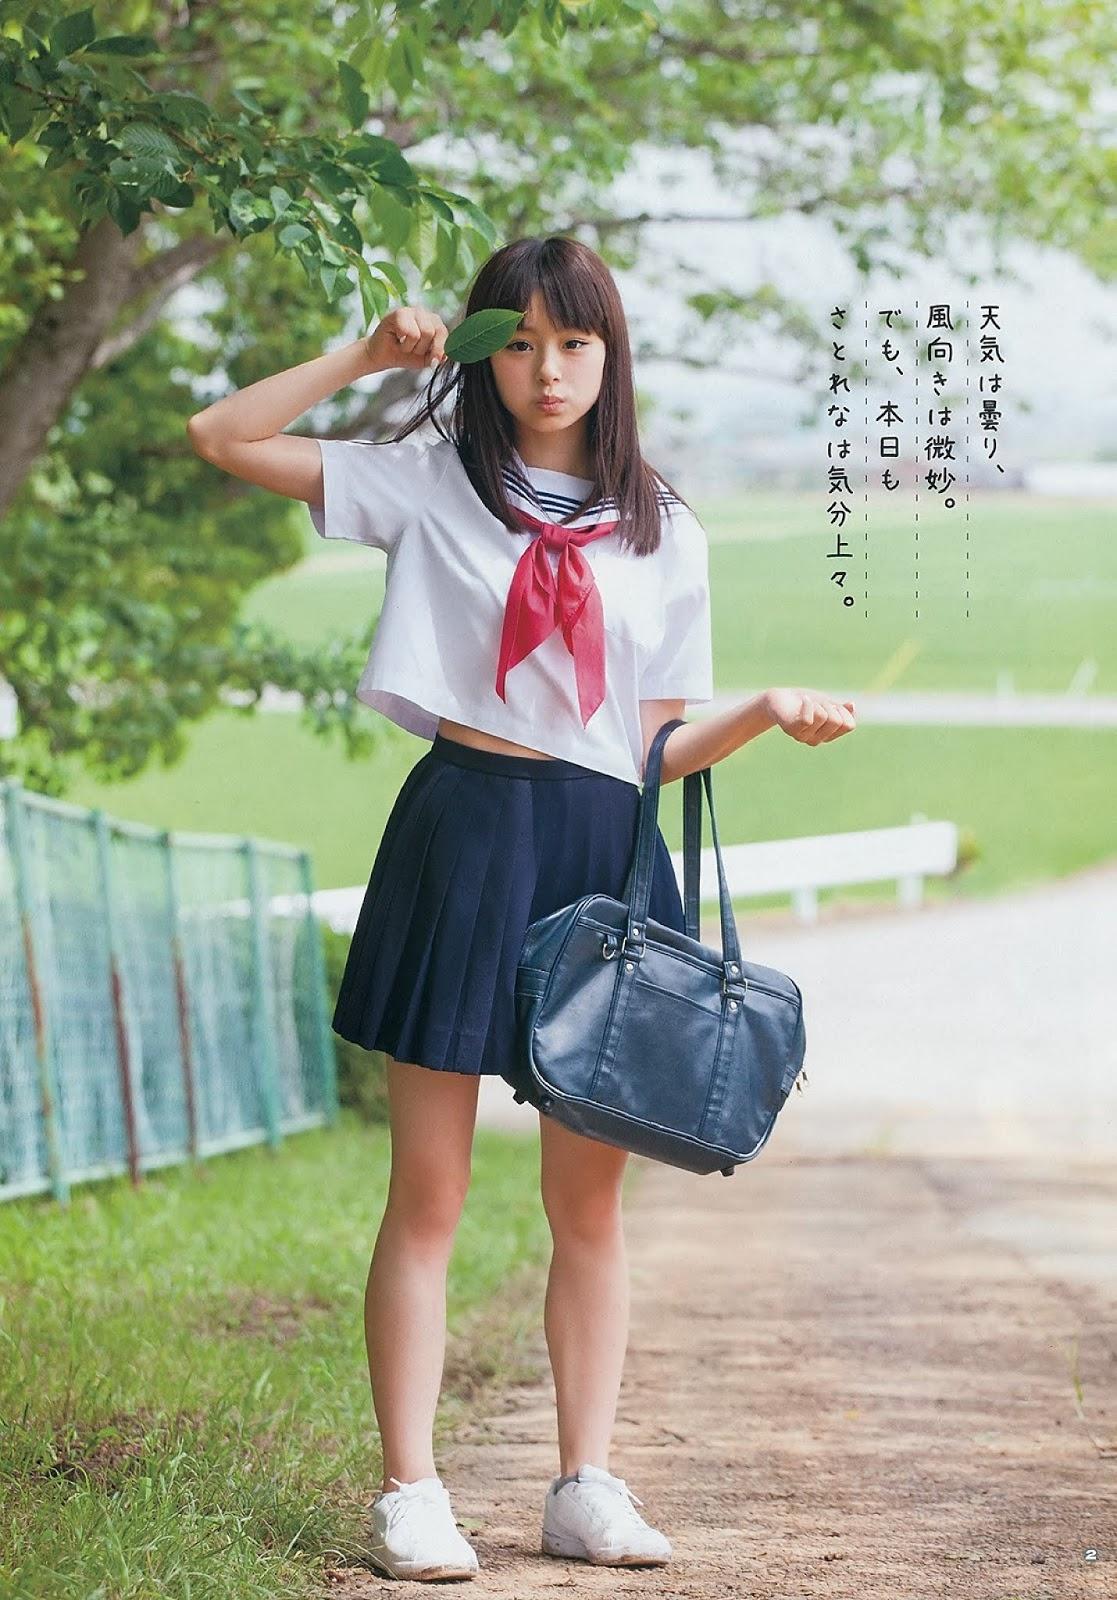 Japanese glamour school girls, gloria reuben sex scene